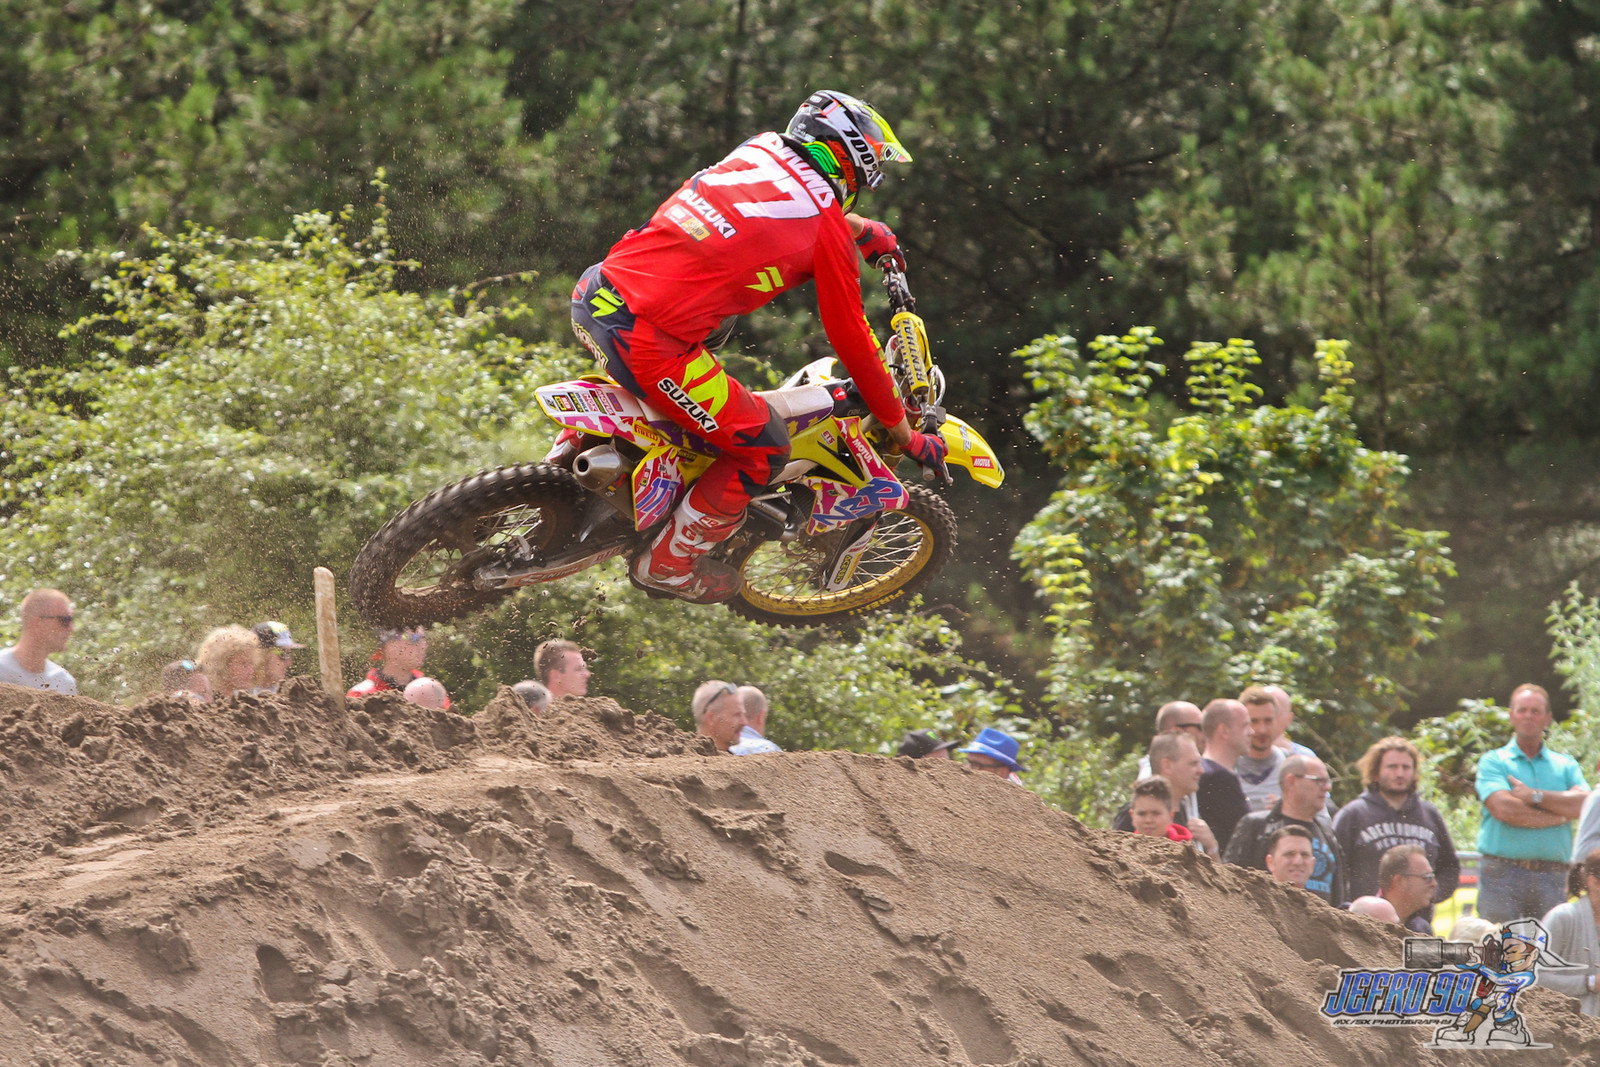 Arminas Jasikonis - Photo Gallery: MXGP of Limburg - Motocross Pictures - Vital MX